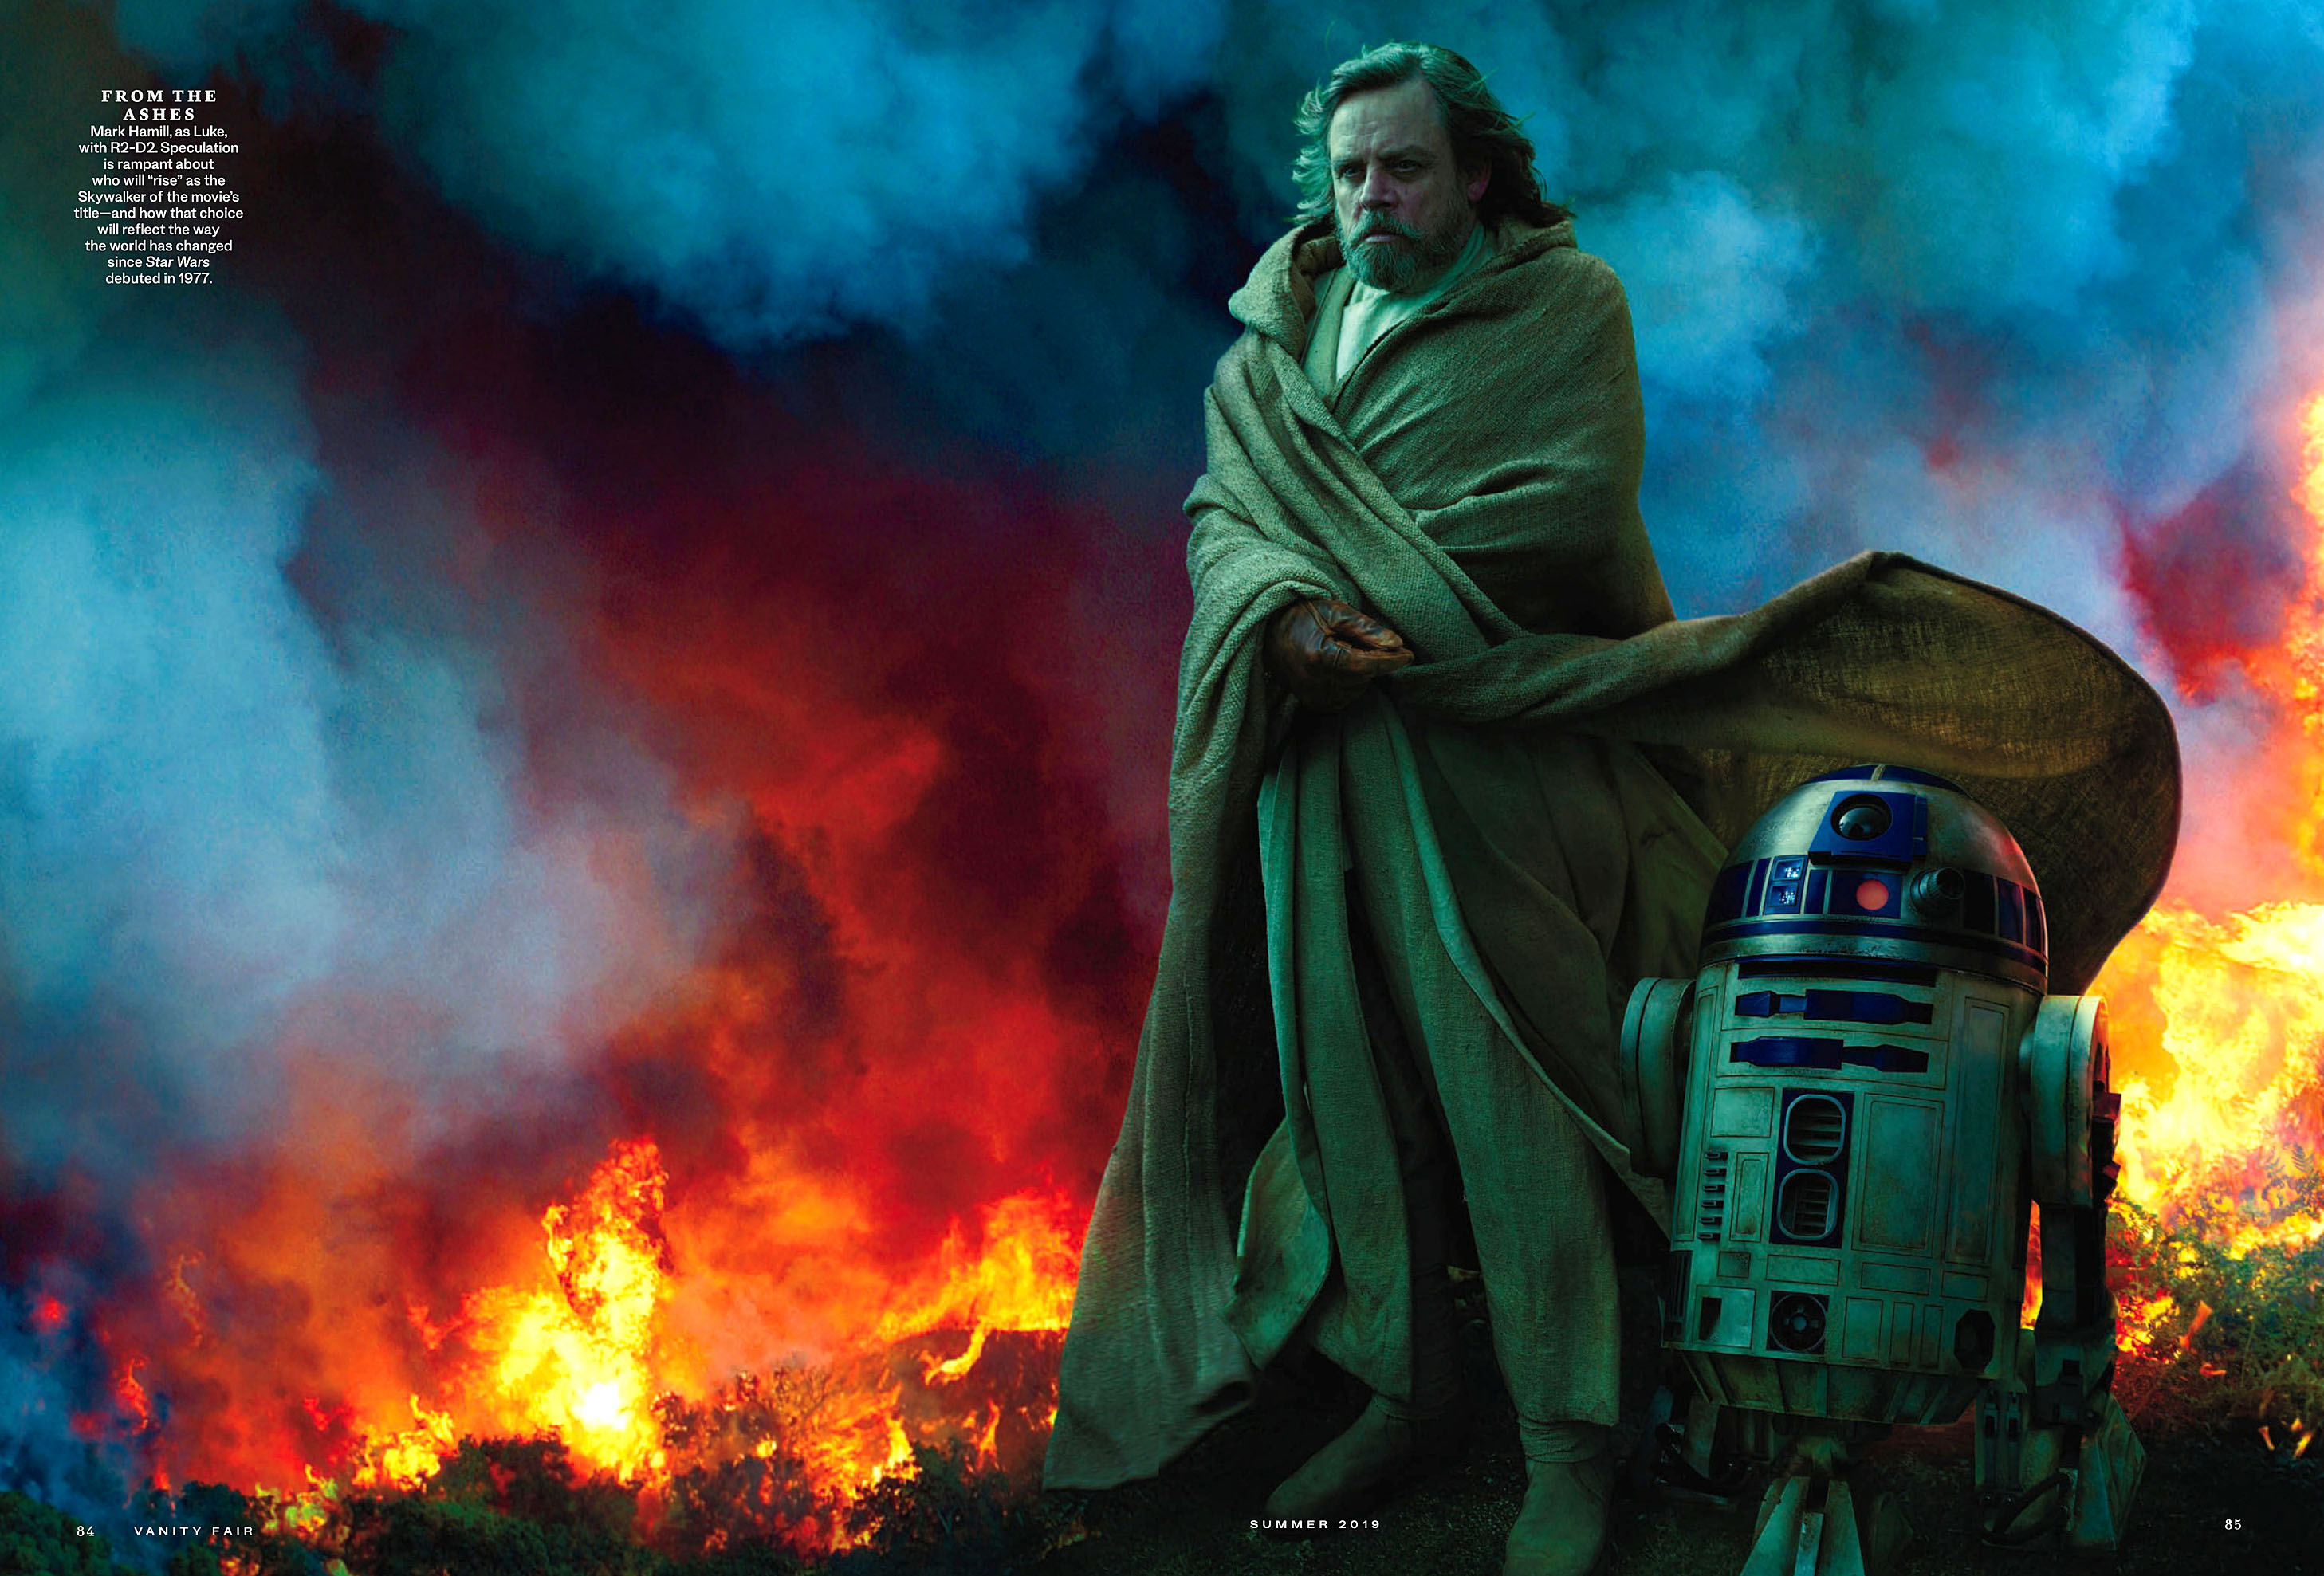 Vanity Fair Summer 2019 Star Wars11.jpg